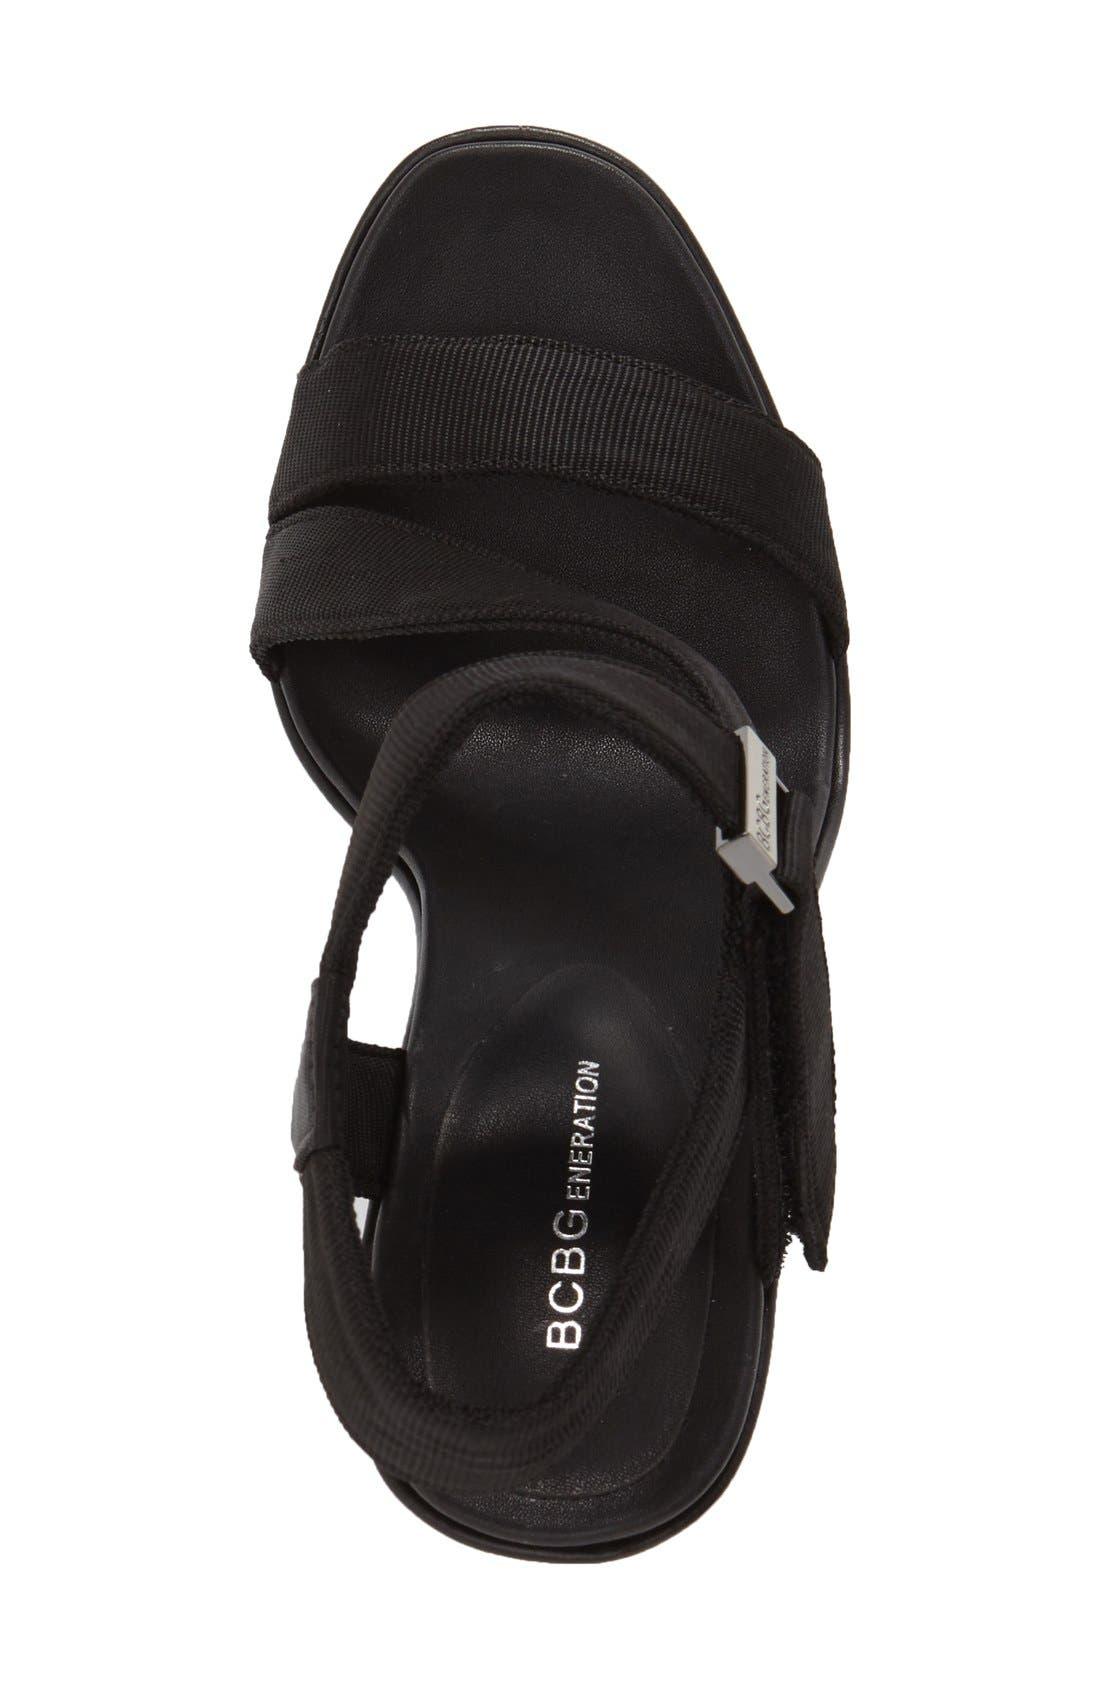 Alternate Image 3  - BCBGeneration 'Carille' Wedge Sandal (Women)